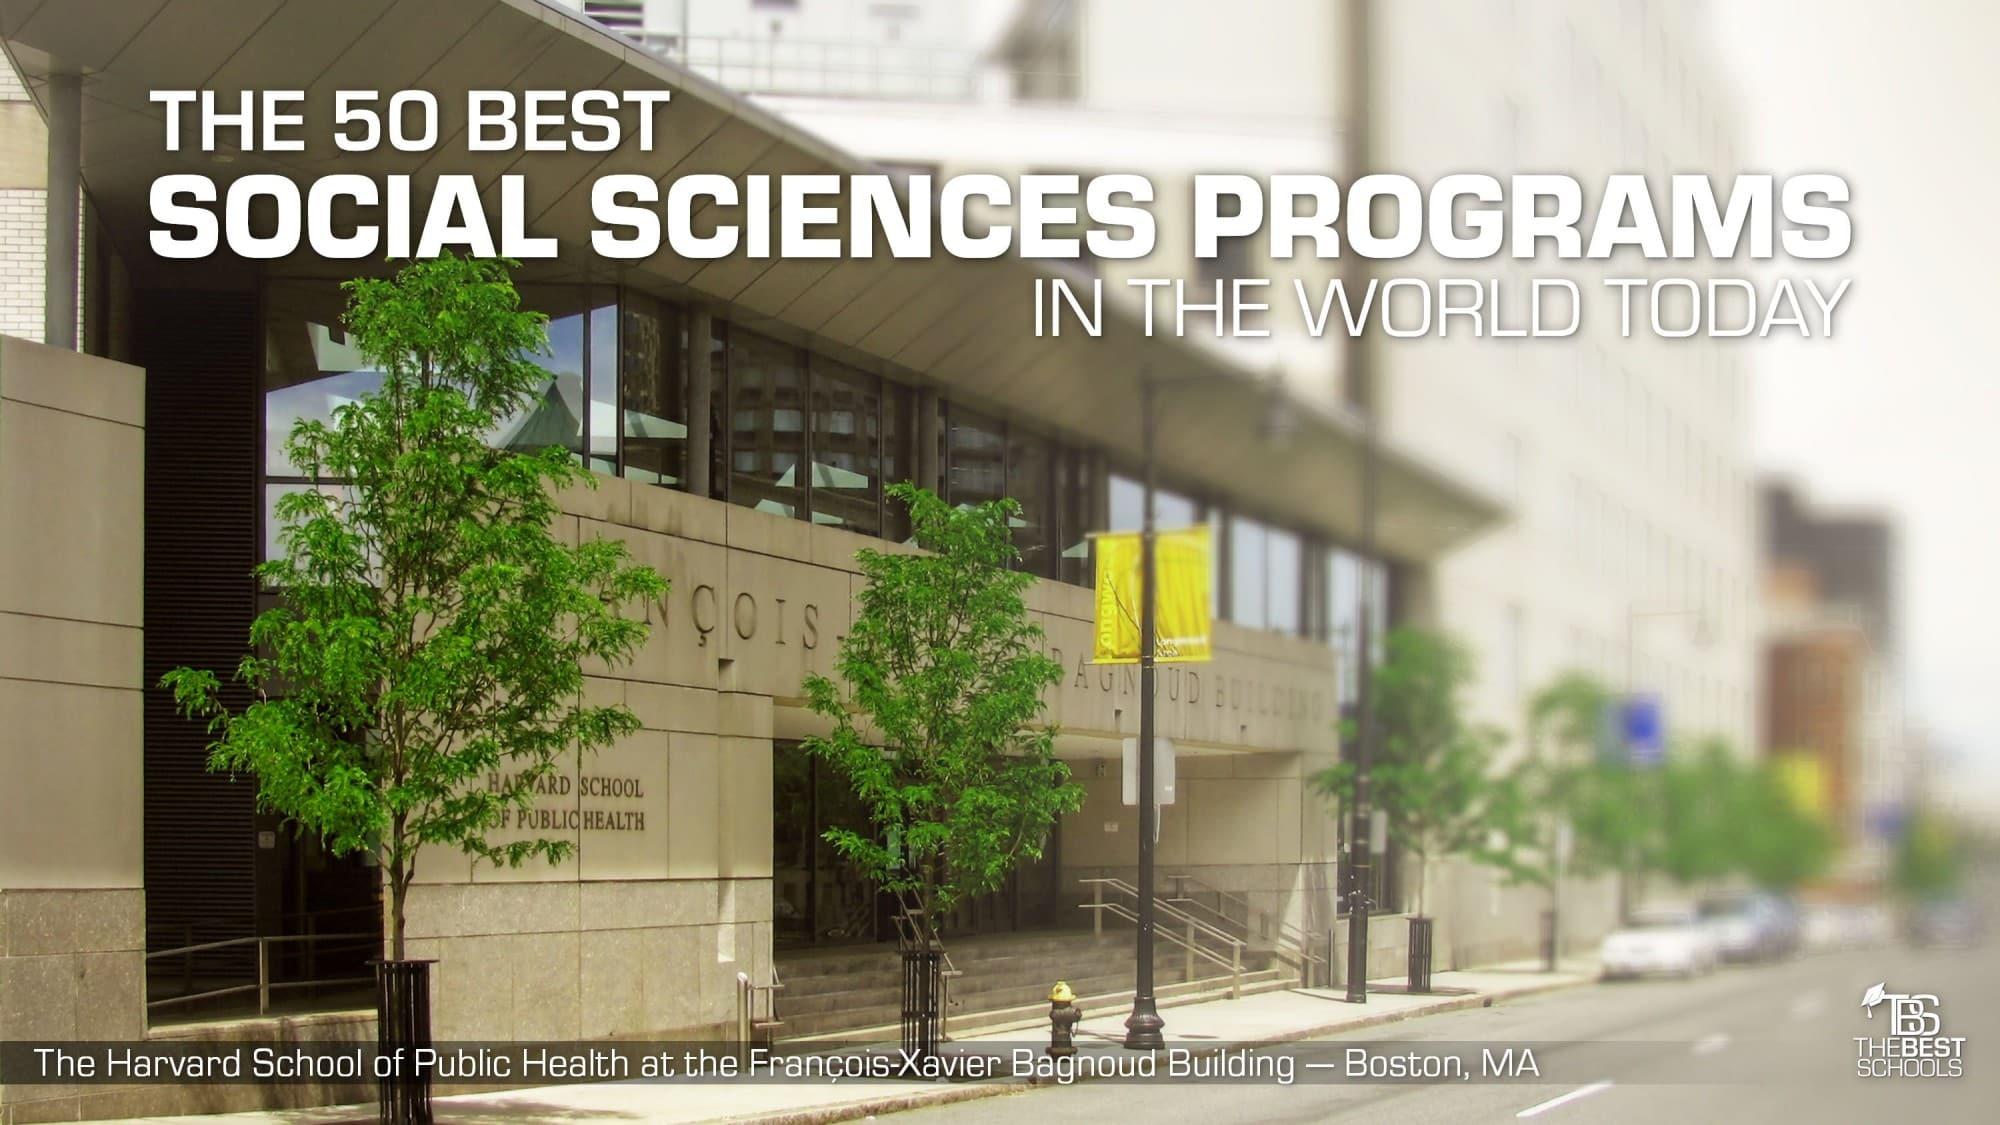 the harvard school of public health at the franois xavier bagnoud building boston